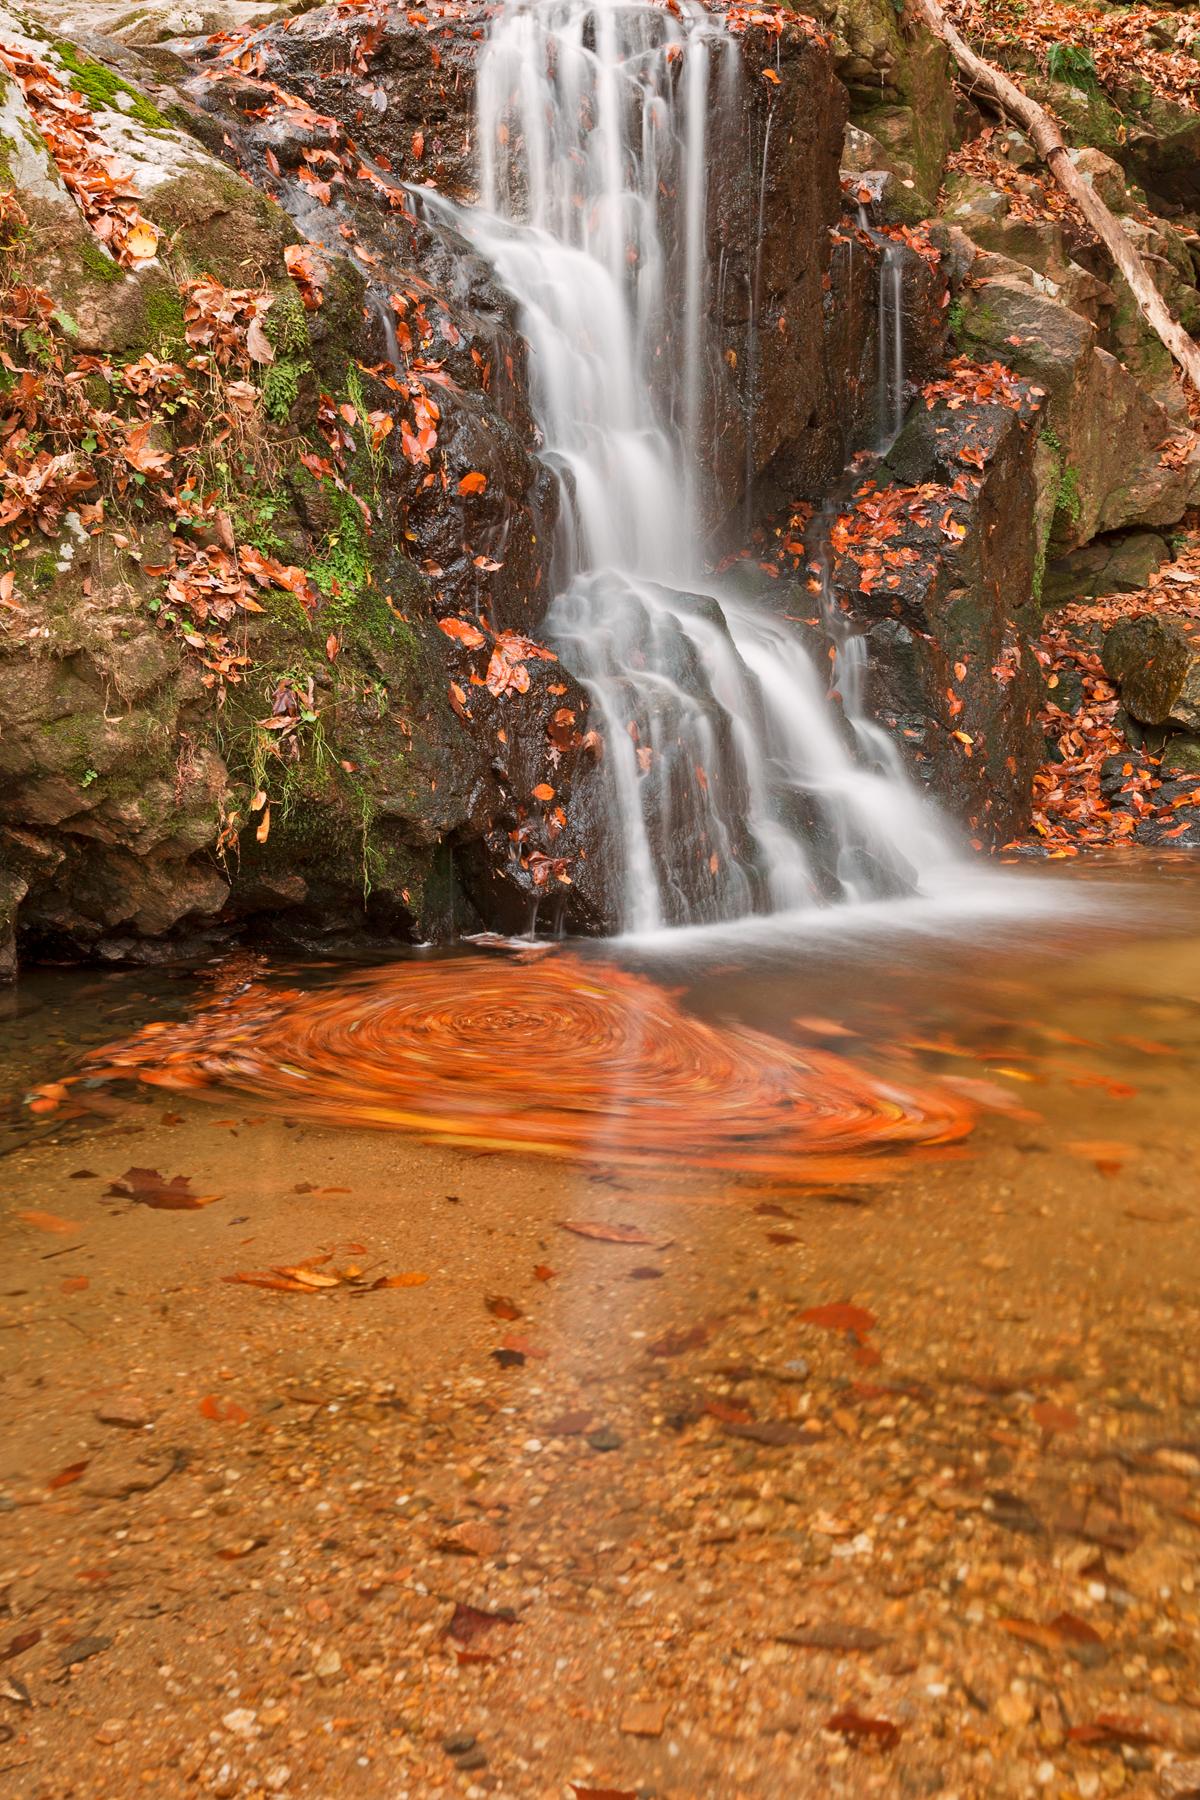 Avalon falls photo